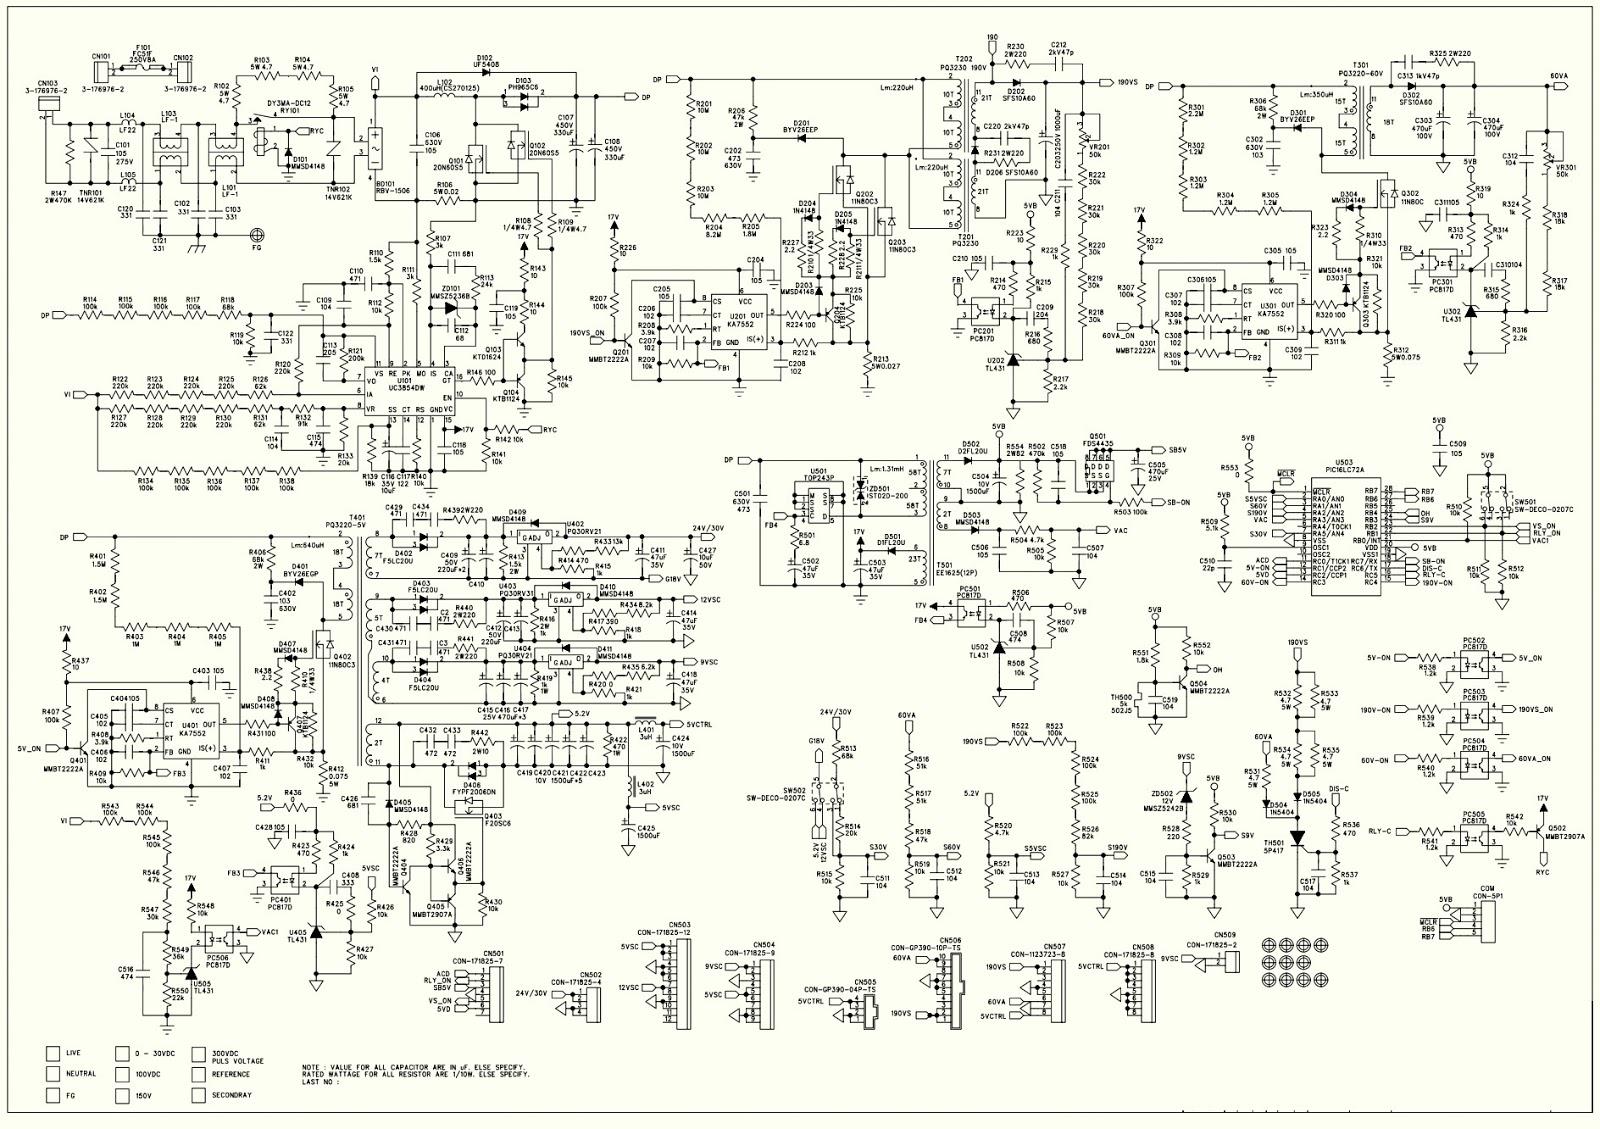 Electro Help  Hyundai 42 Inch Plasma Tv Smps Usp490m